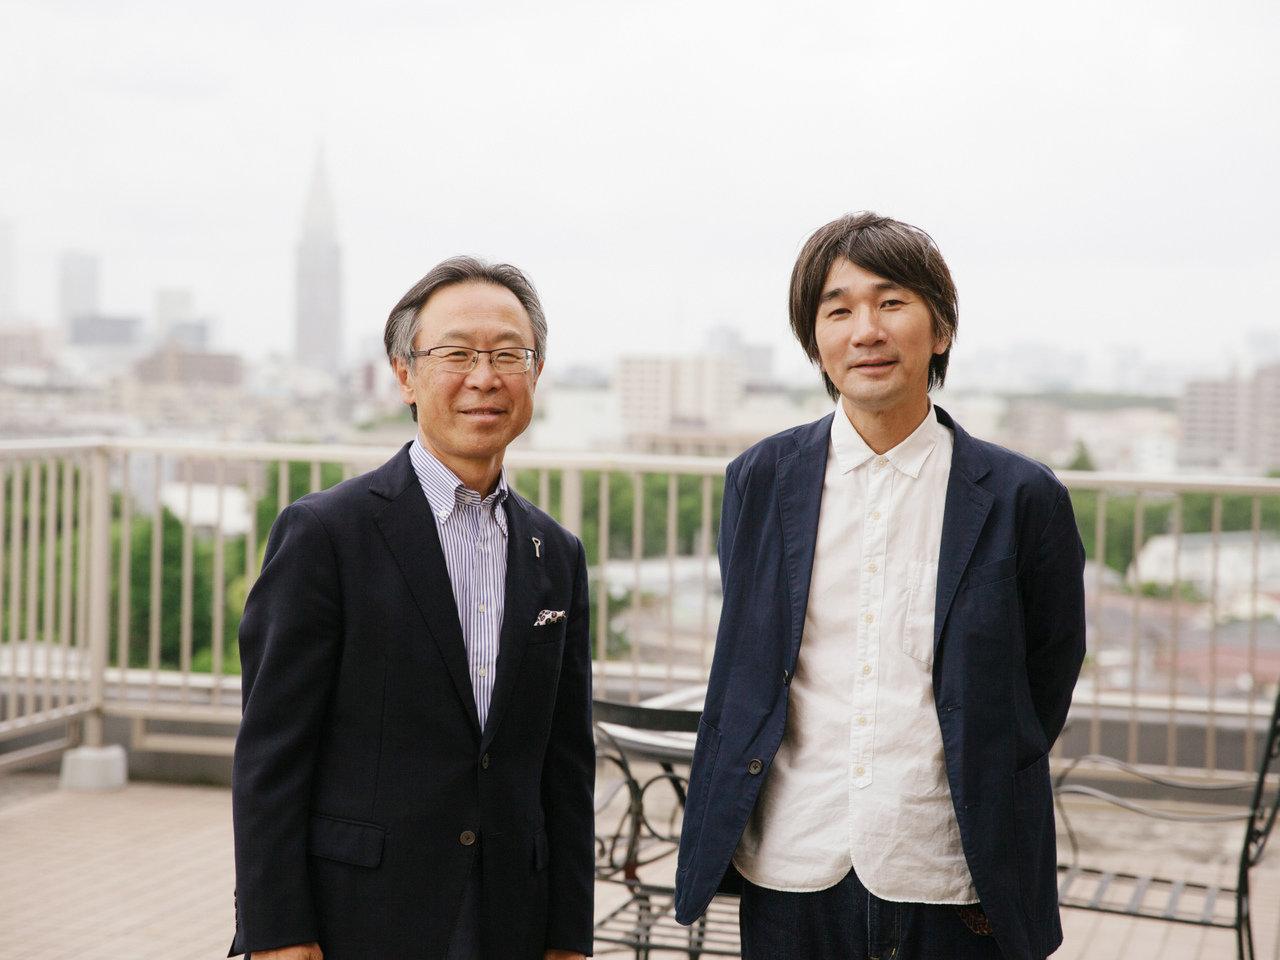 SDGsはどうやって出来たのか?前・国連大使の吉川元偉さんと編集長・指出が語り合いました。